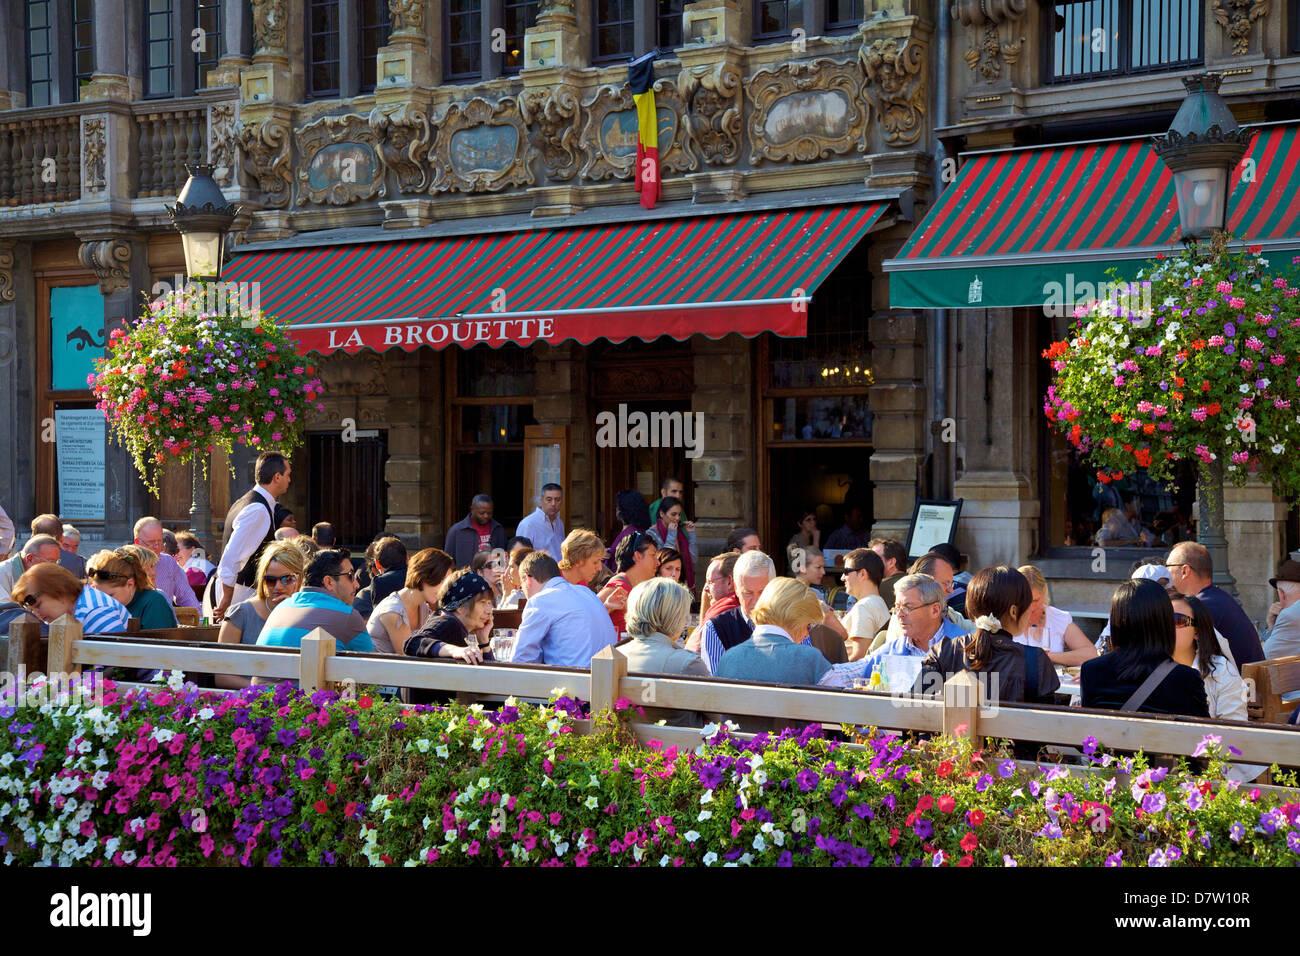 Restaurant, Grand Place, UNESCO World Heritage Site, Brussels, Belgium - Stock Image